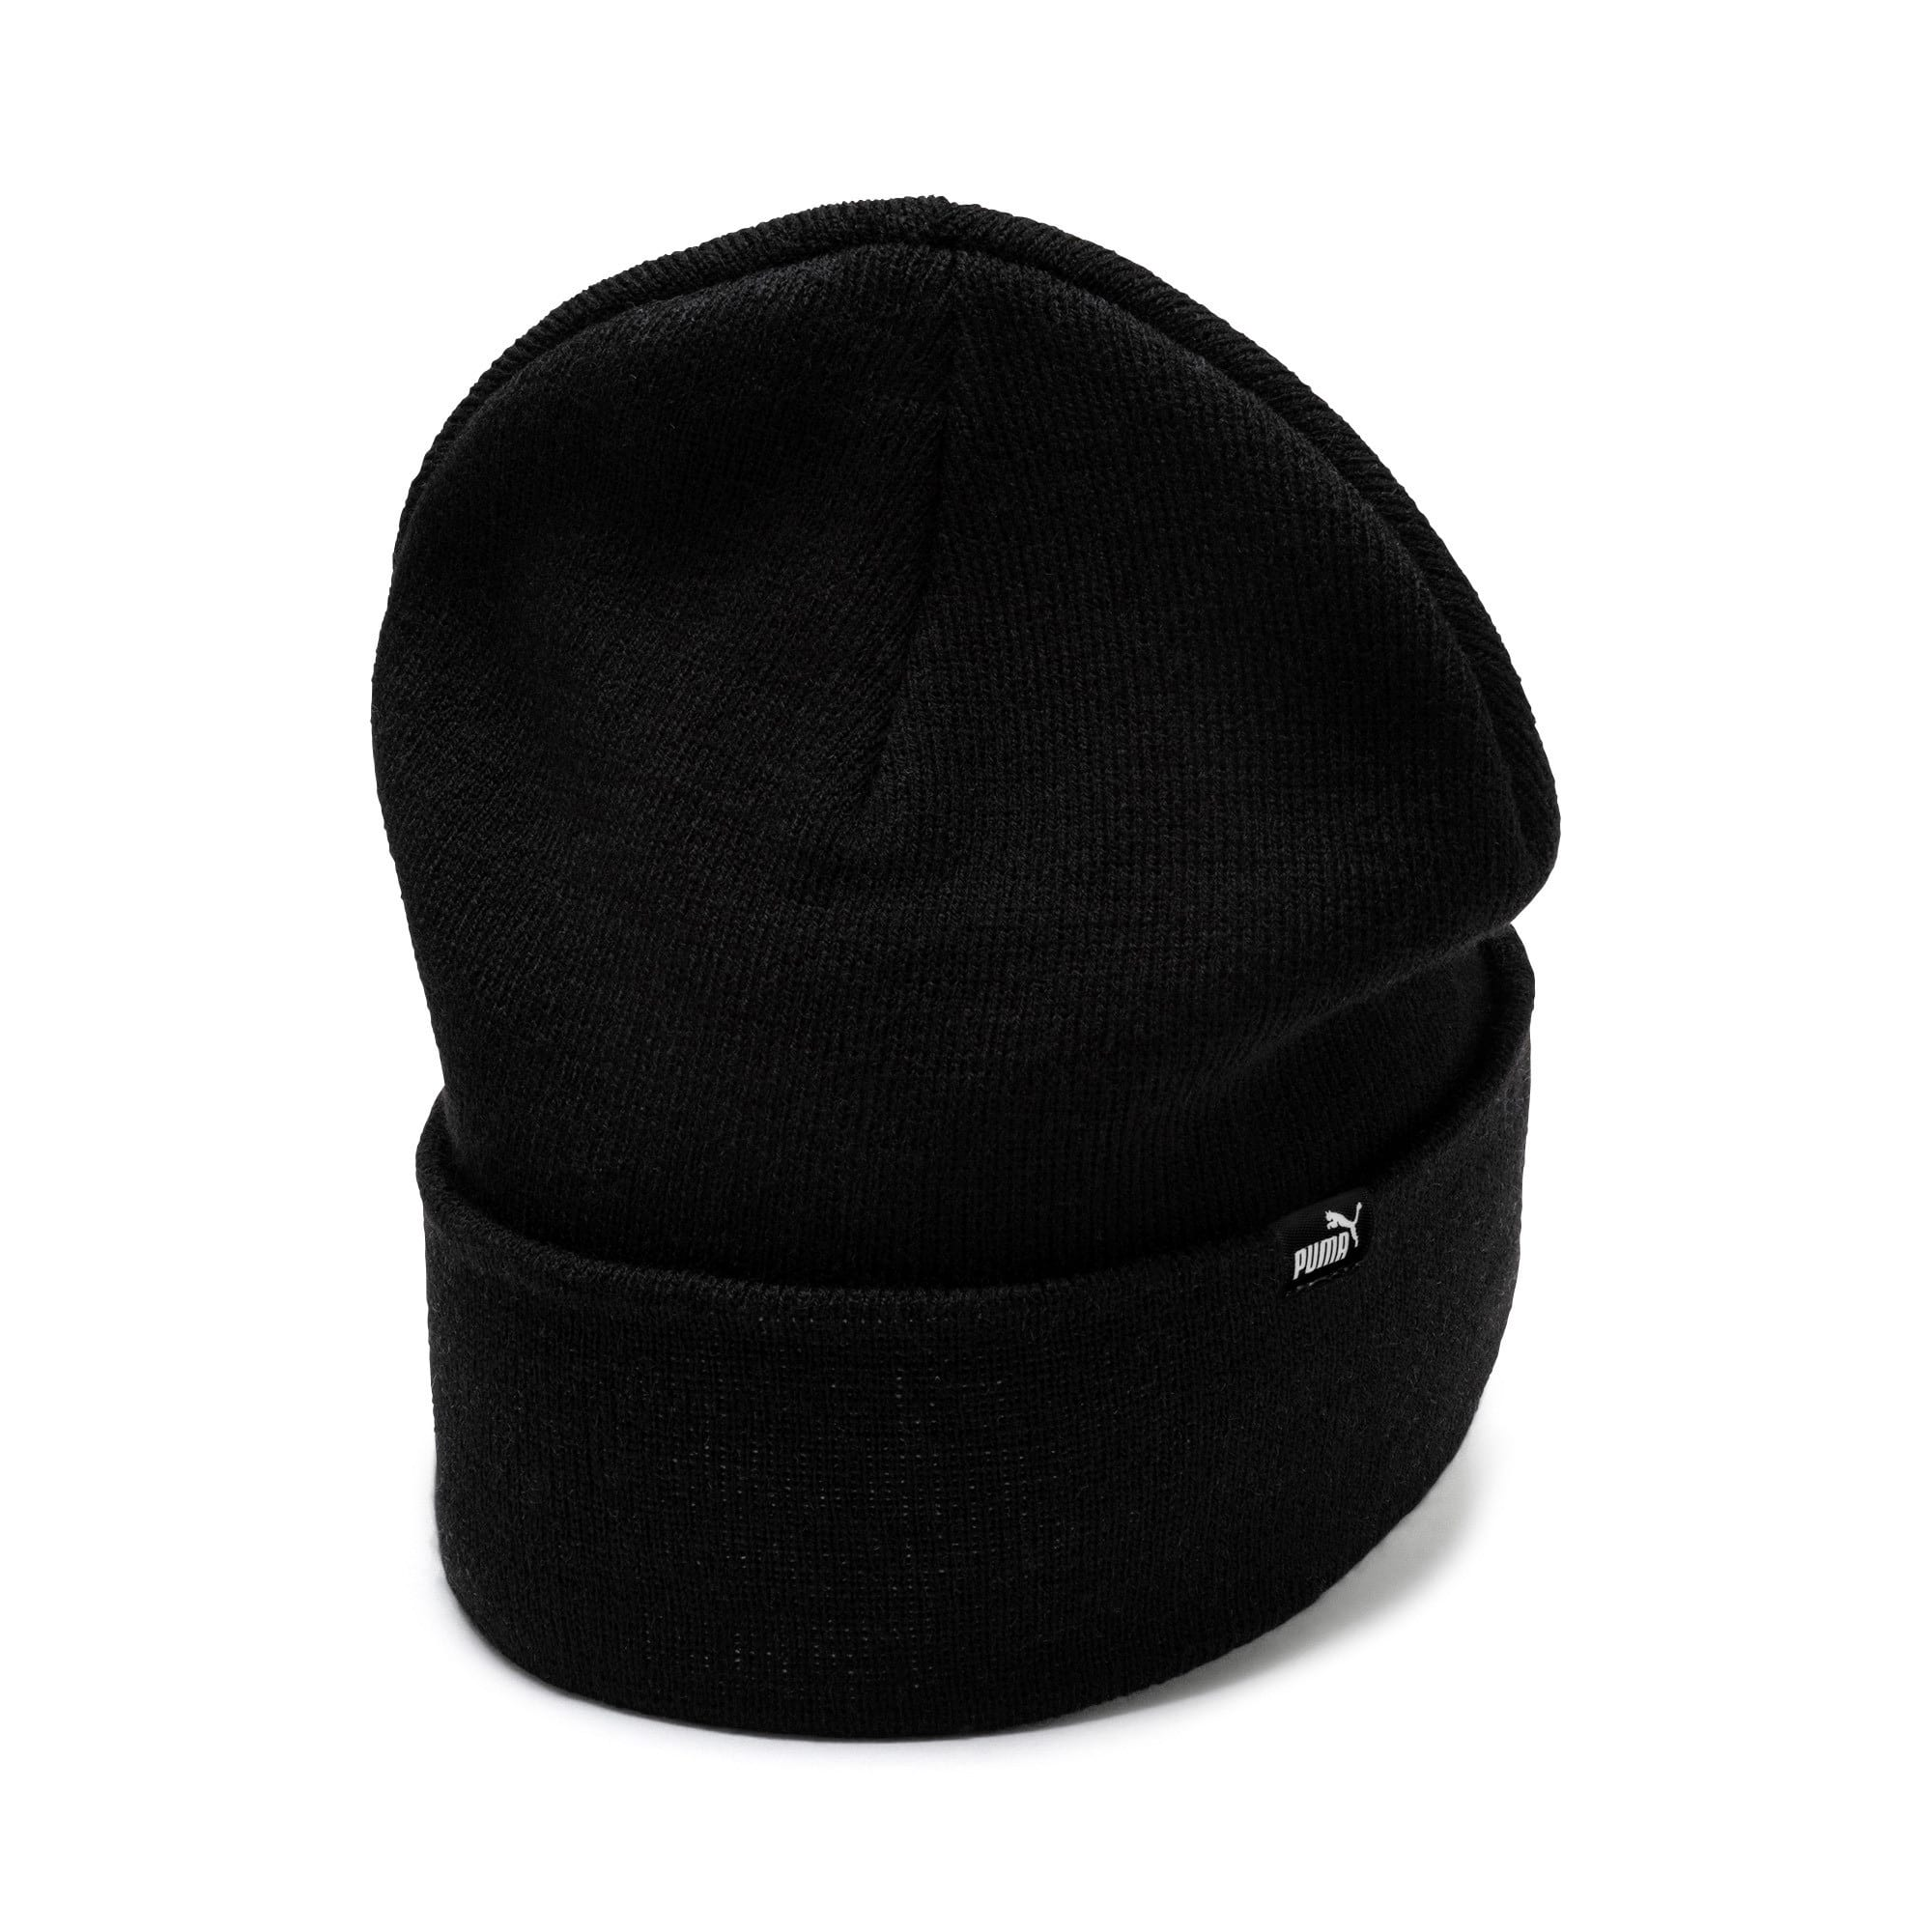 Miniatura 2 de Gorro de lana de calce medio, Puma Black, mediano